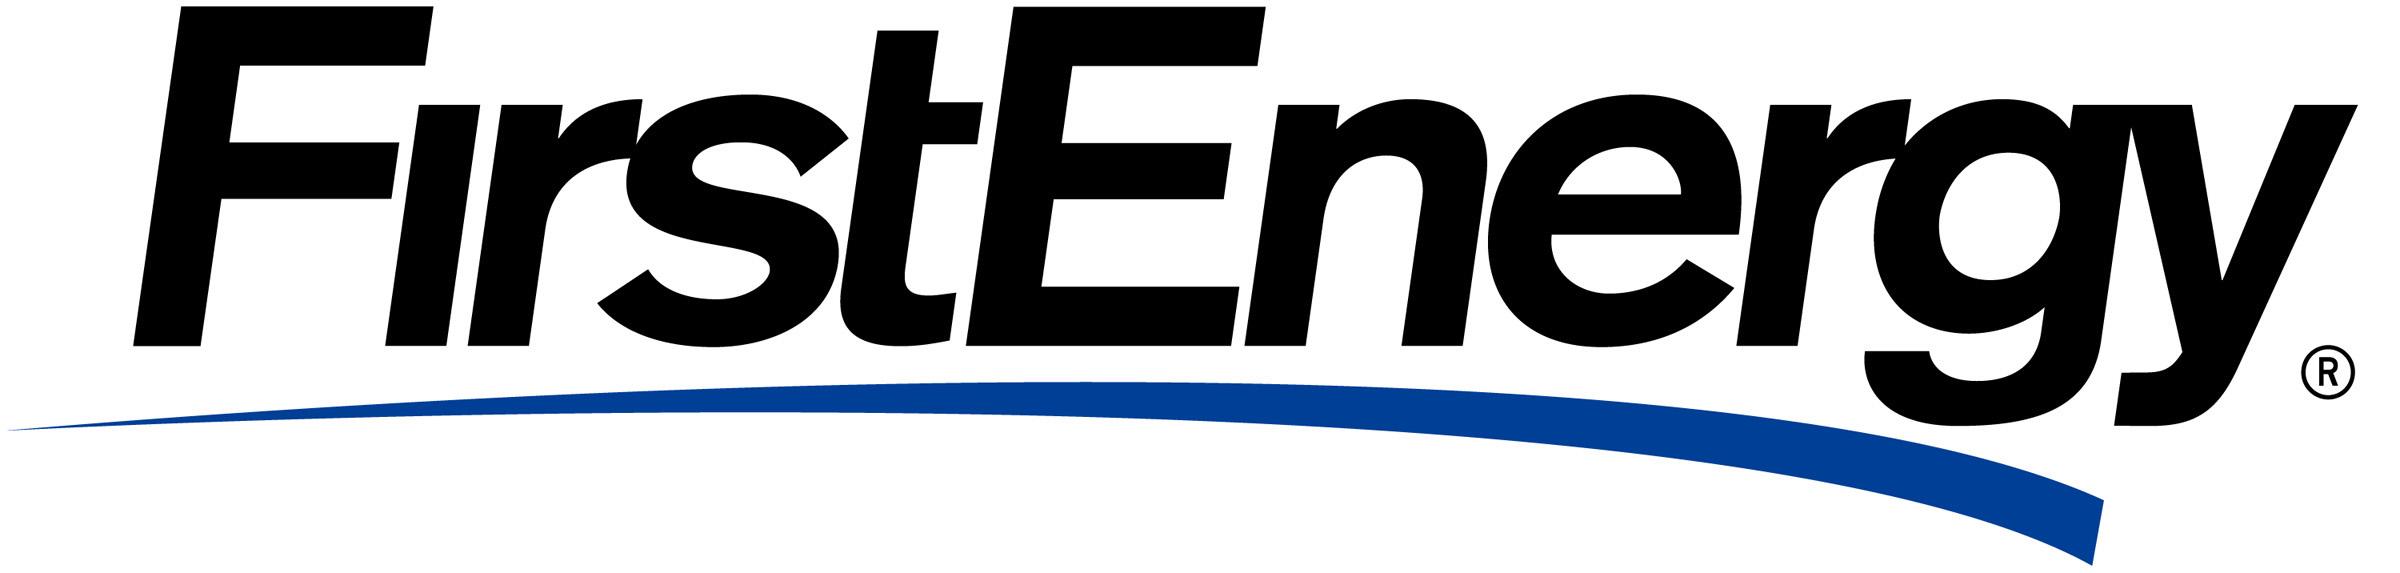 FirstEnergy_logo.jpg